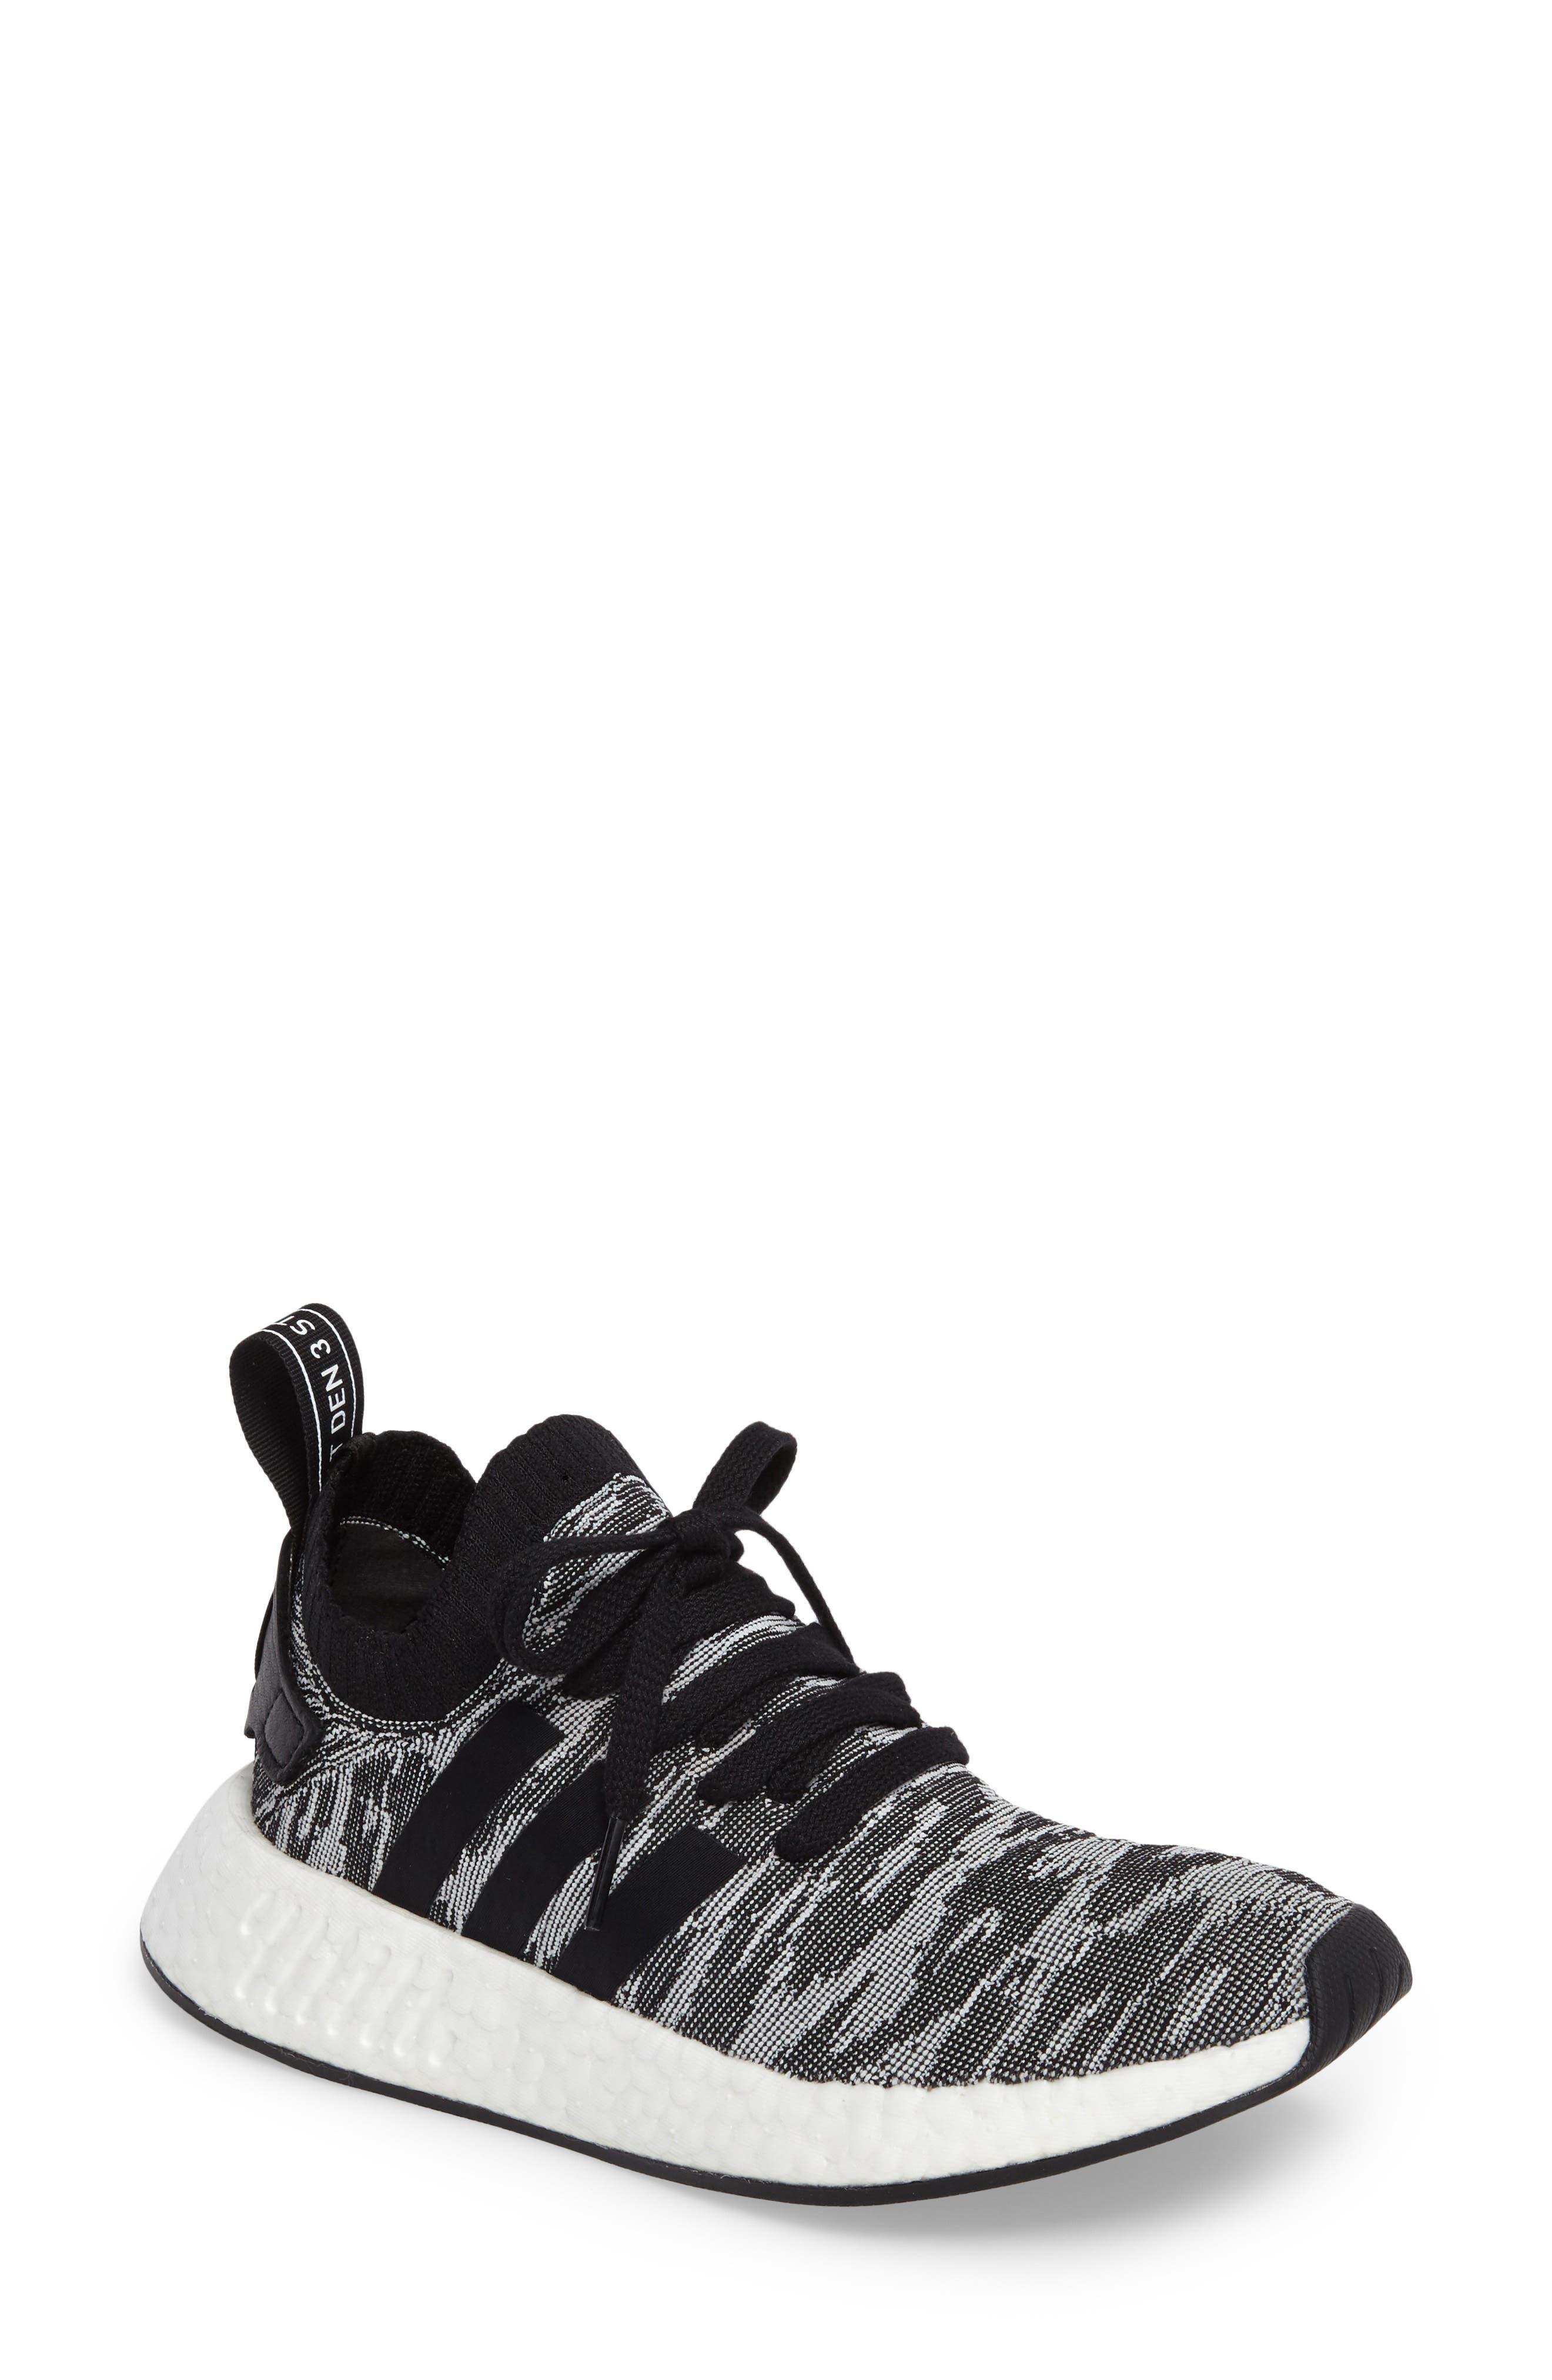 ADIDAS NMD R2 Primeknit Athletic Shoe